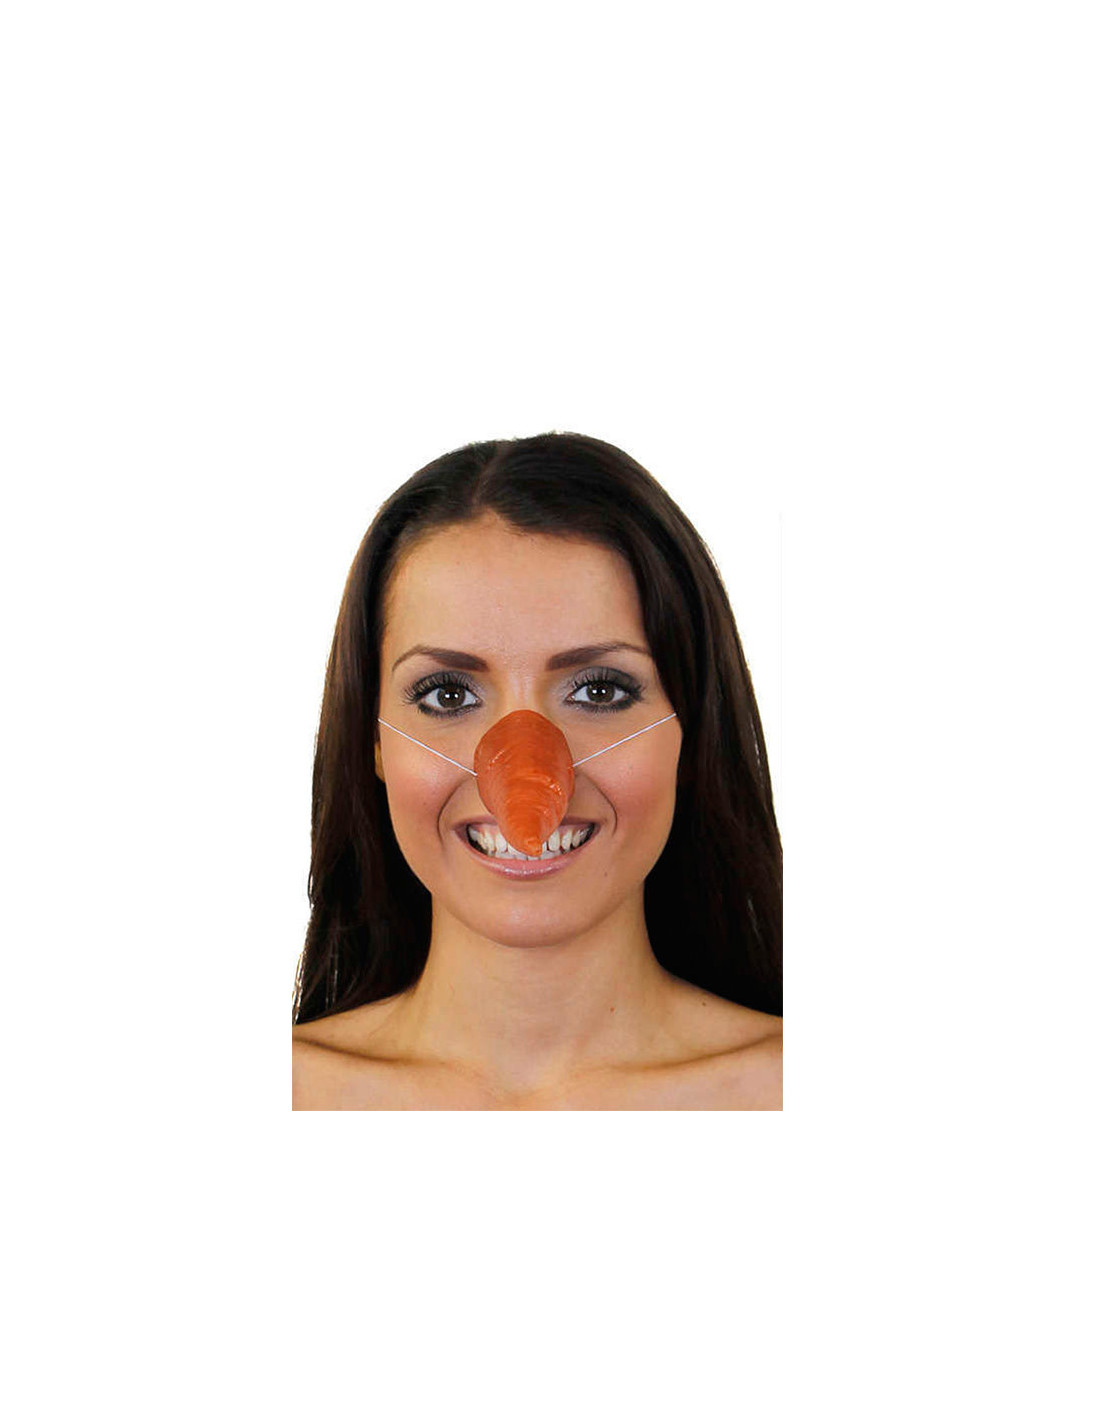 Nariz De Zanahoria Para Muneco De Nieve Compra En Disfraces Bacanal Shows para eventos infantiles y adultos como: nariz de zanahoria para muneco de nieve compra en disfraces bacanal